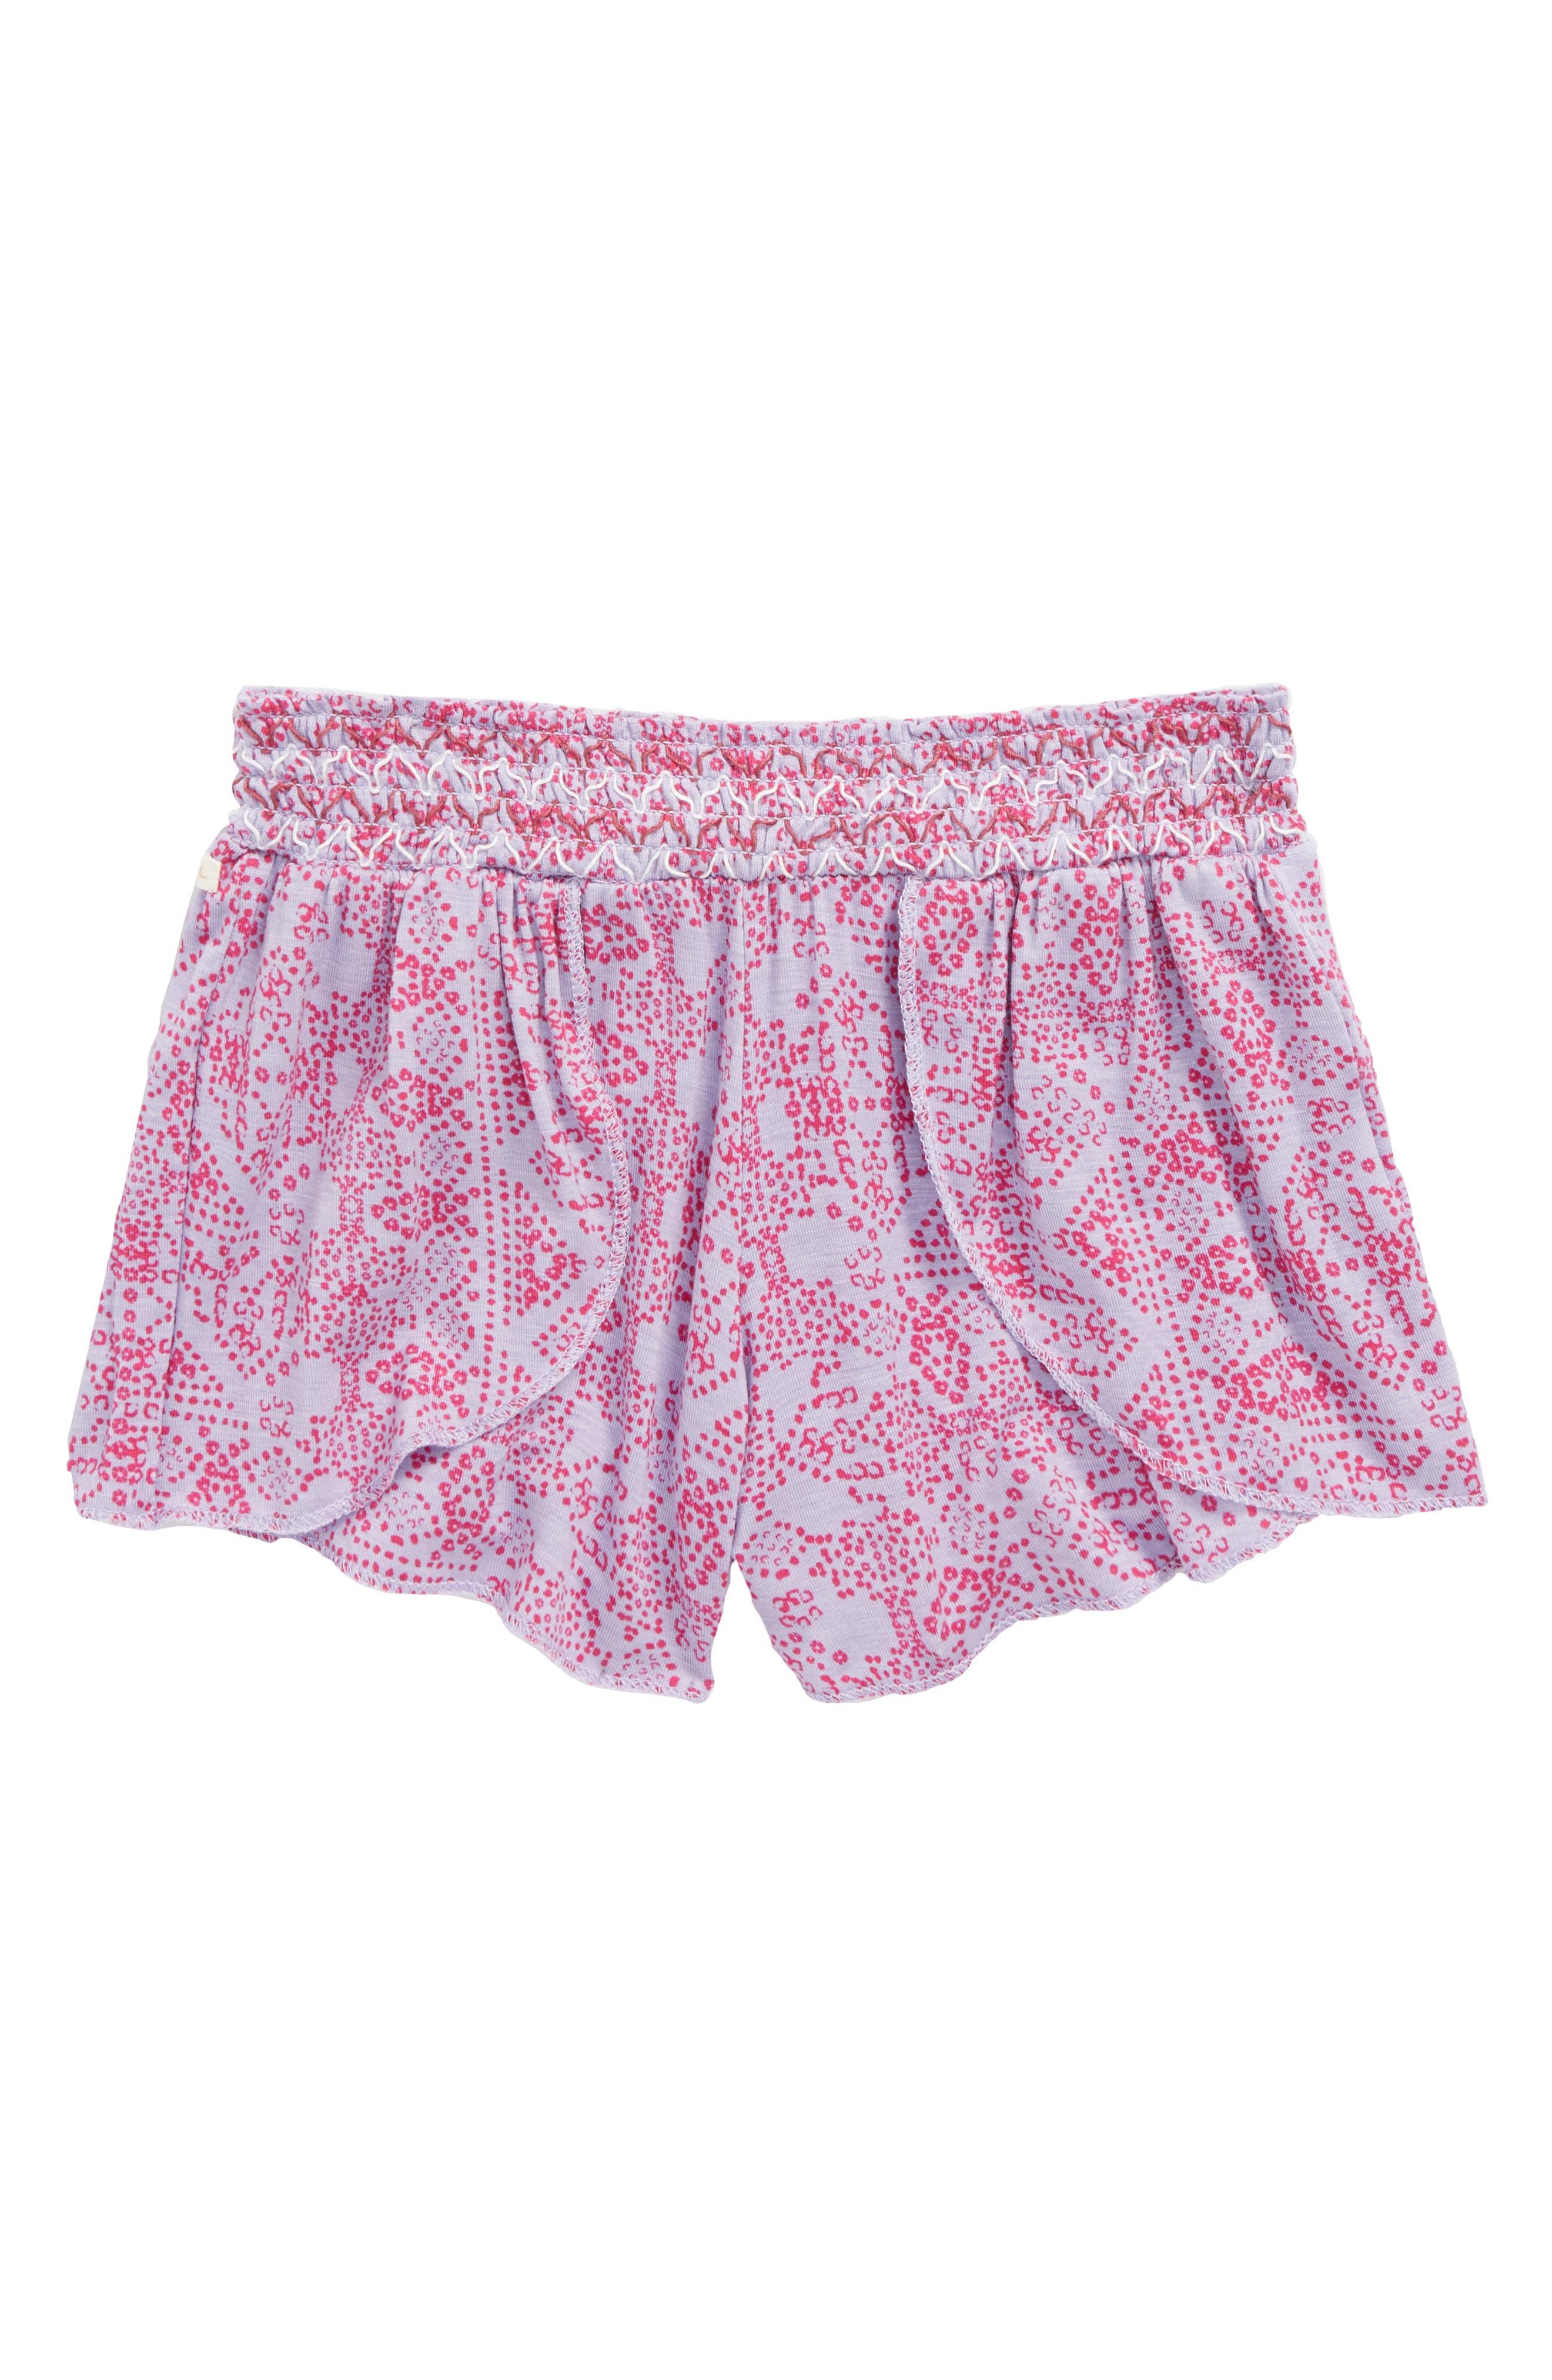 Dulce Smocked Shorts,                         Main,                         color, Heriloom Lilac - Lav